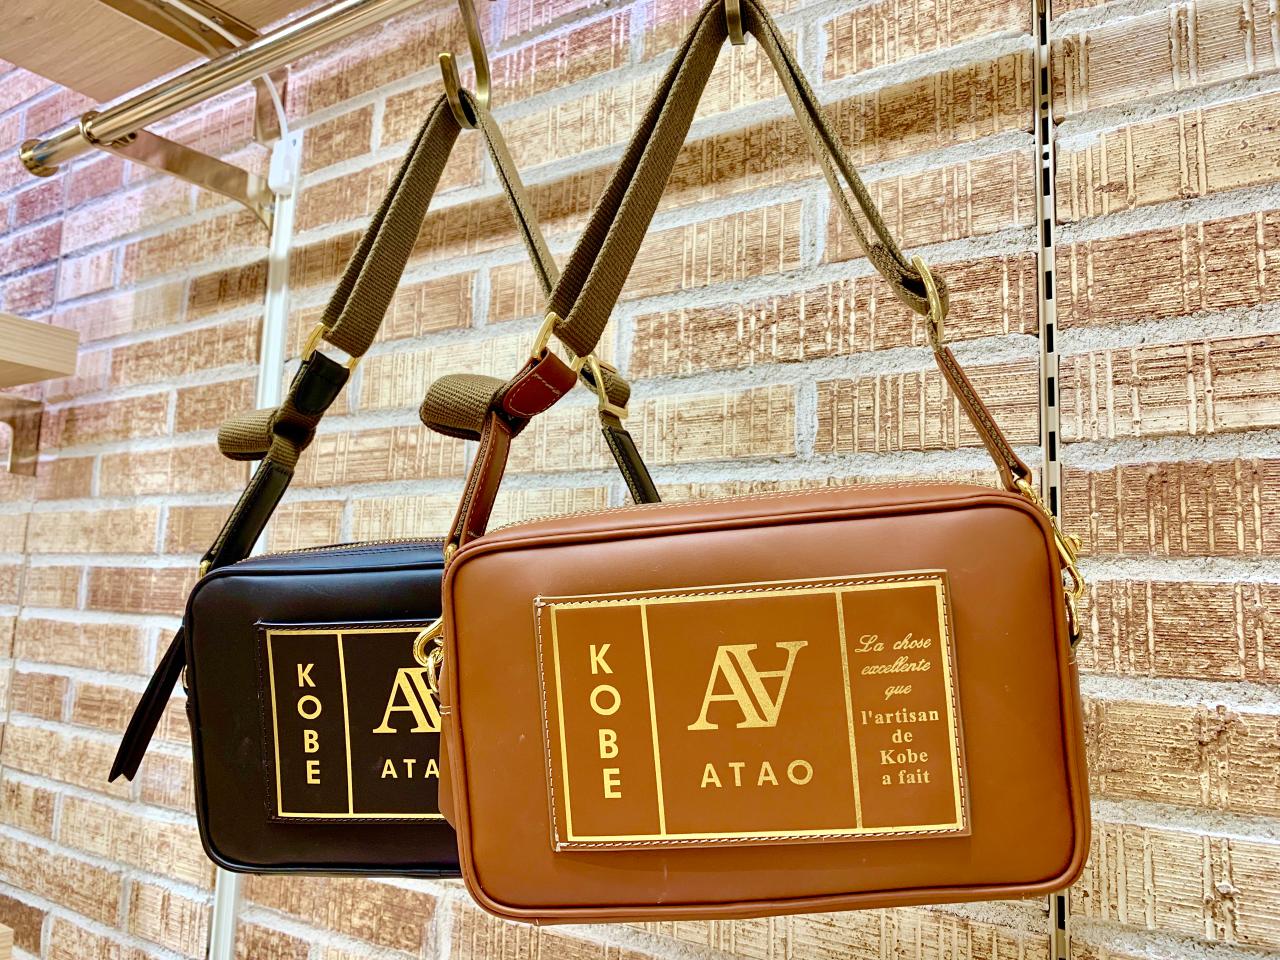 e3940a259b83 ATAO(アタオ) | スタジオアタオ公式ショップブログ|STUDIOATAO OFFICIAL BLOG